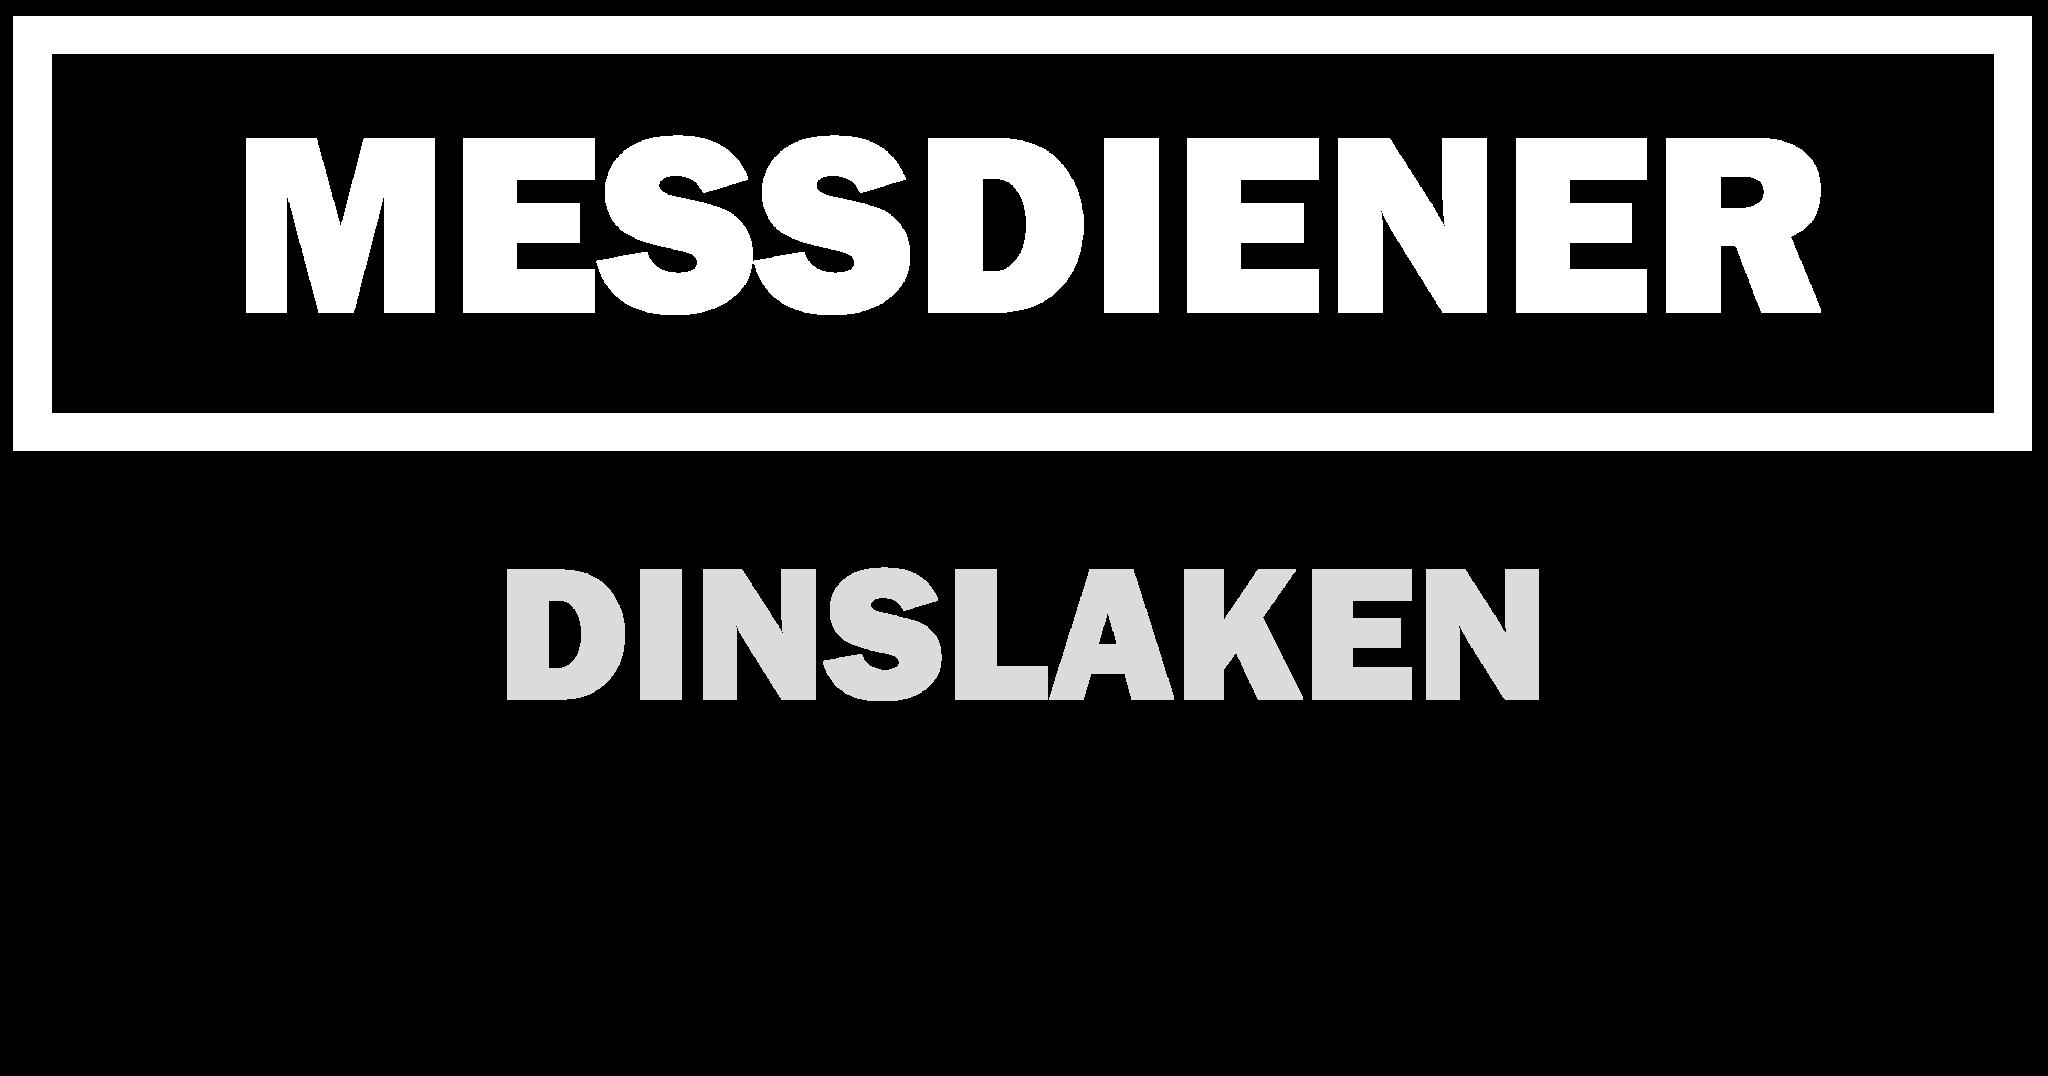 Messdiener St. Vincentius Dinslaken